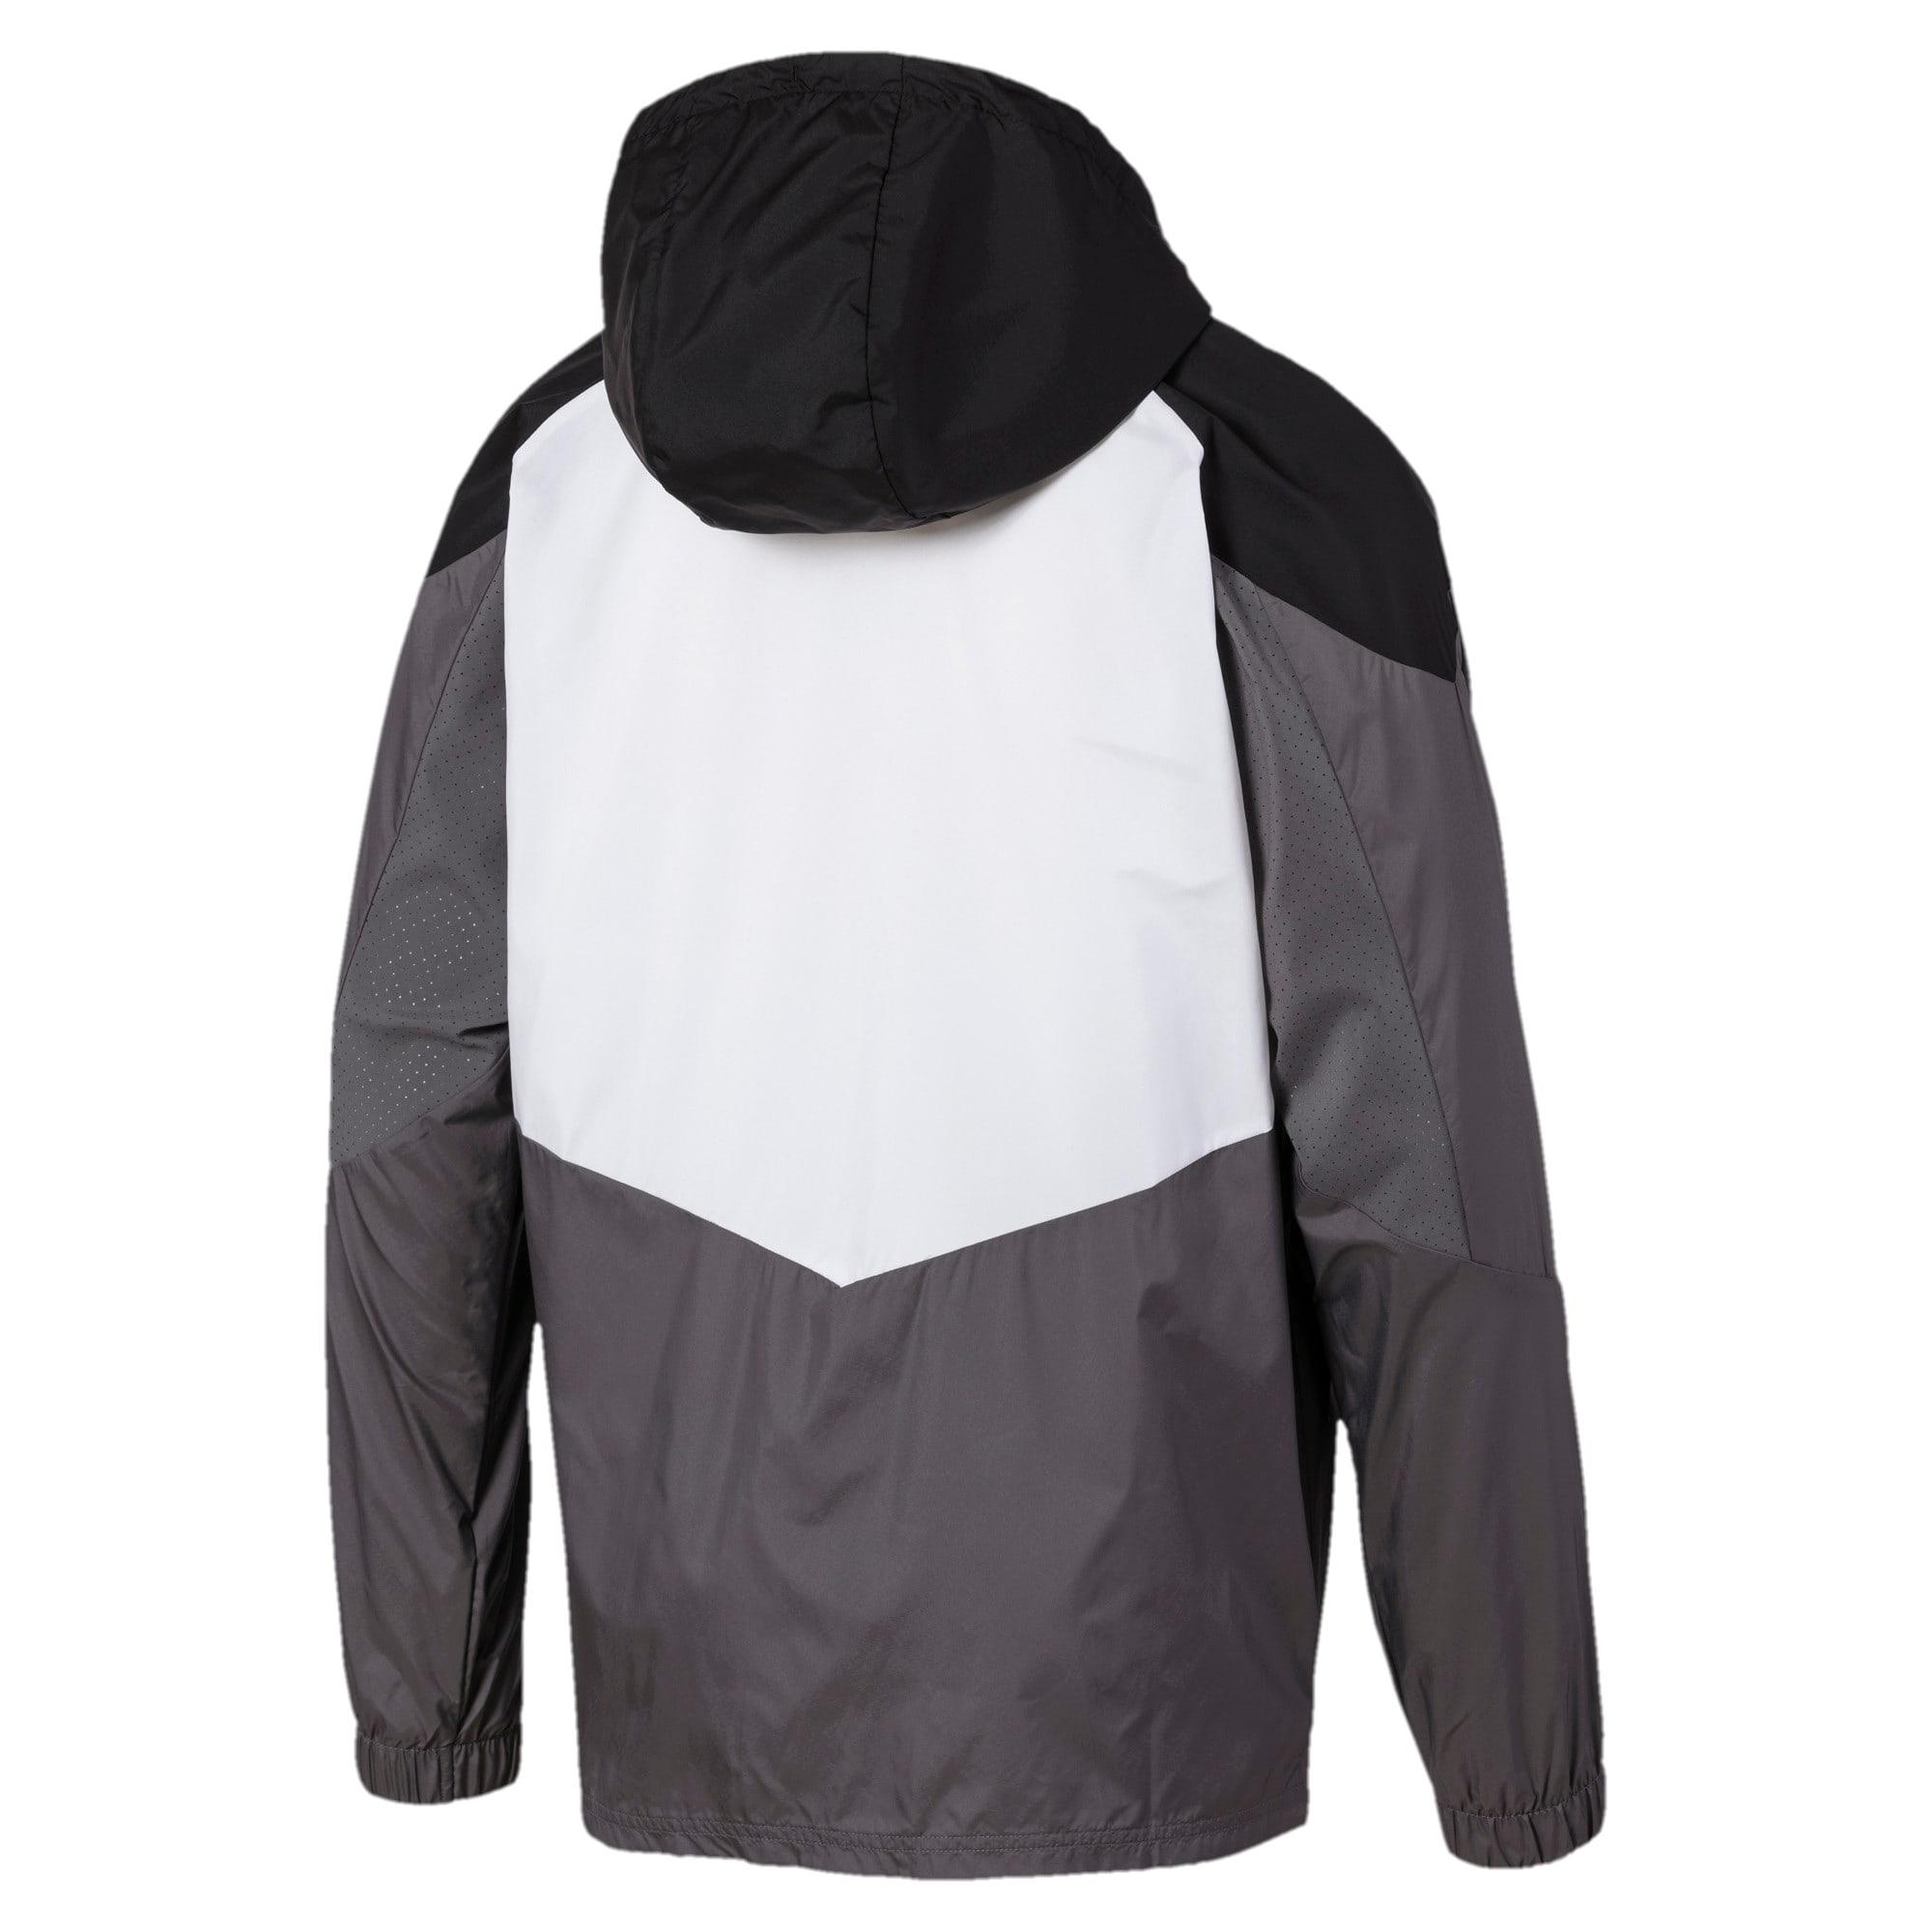 Thumbnail 5 of Reactive Woven Men's Training Jacket, Black-CASTLEROCK-White, medium